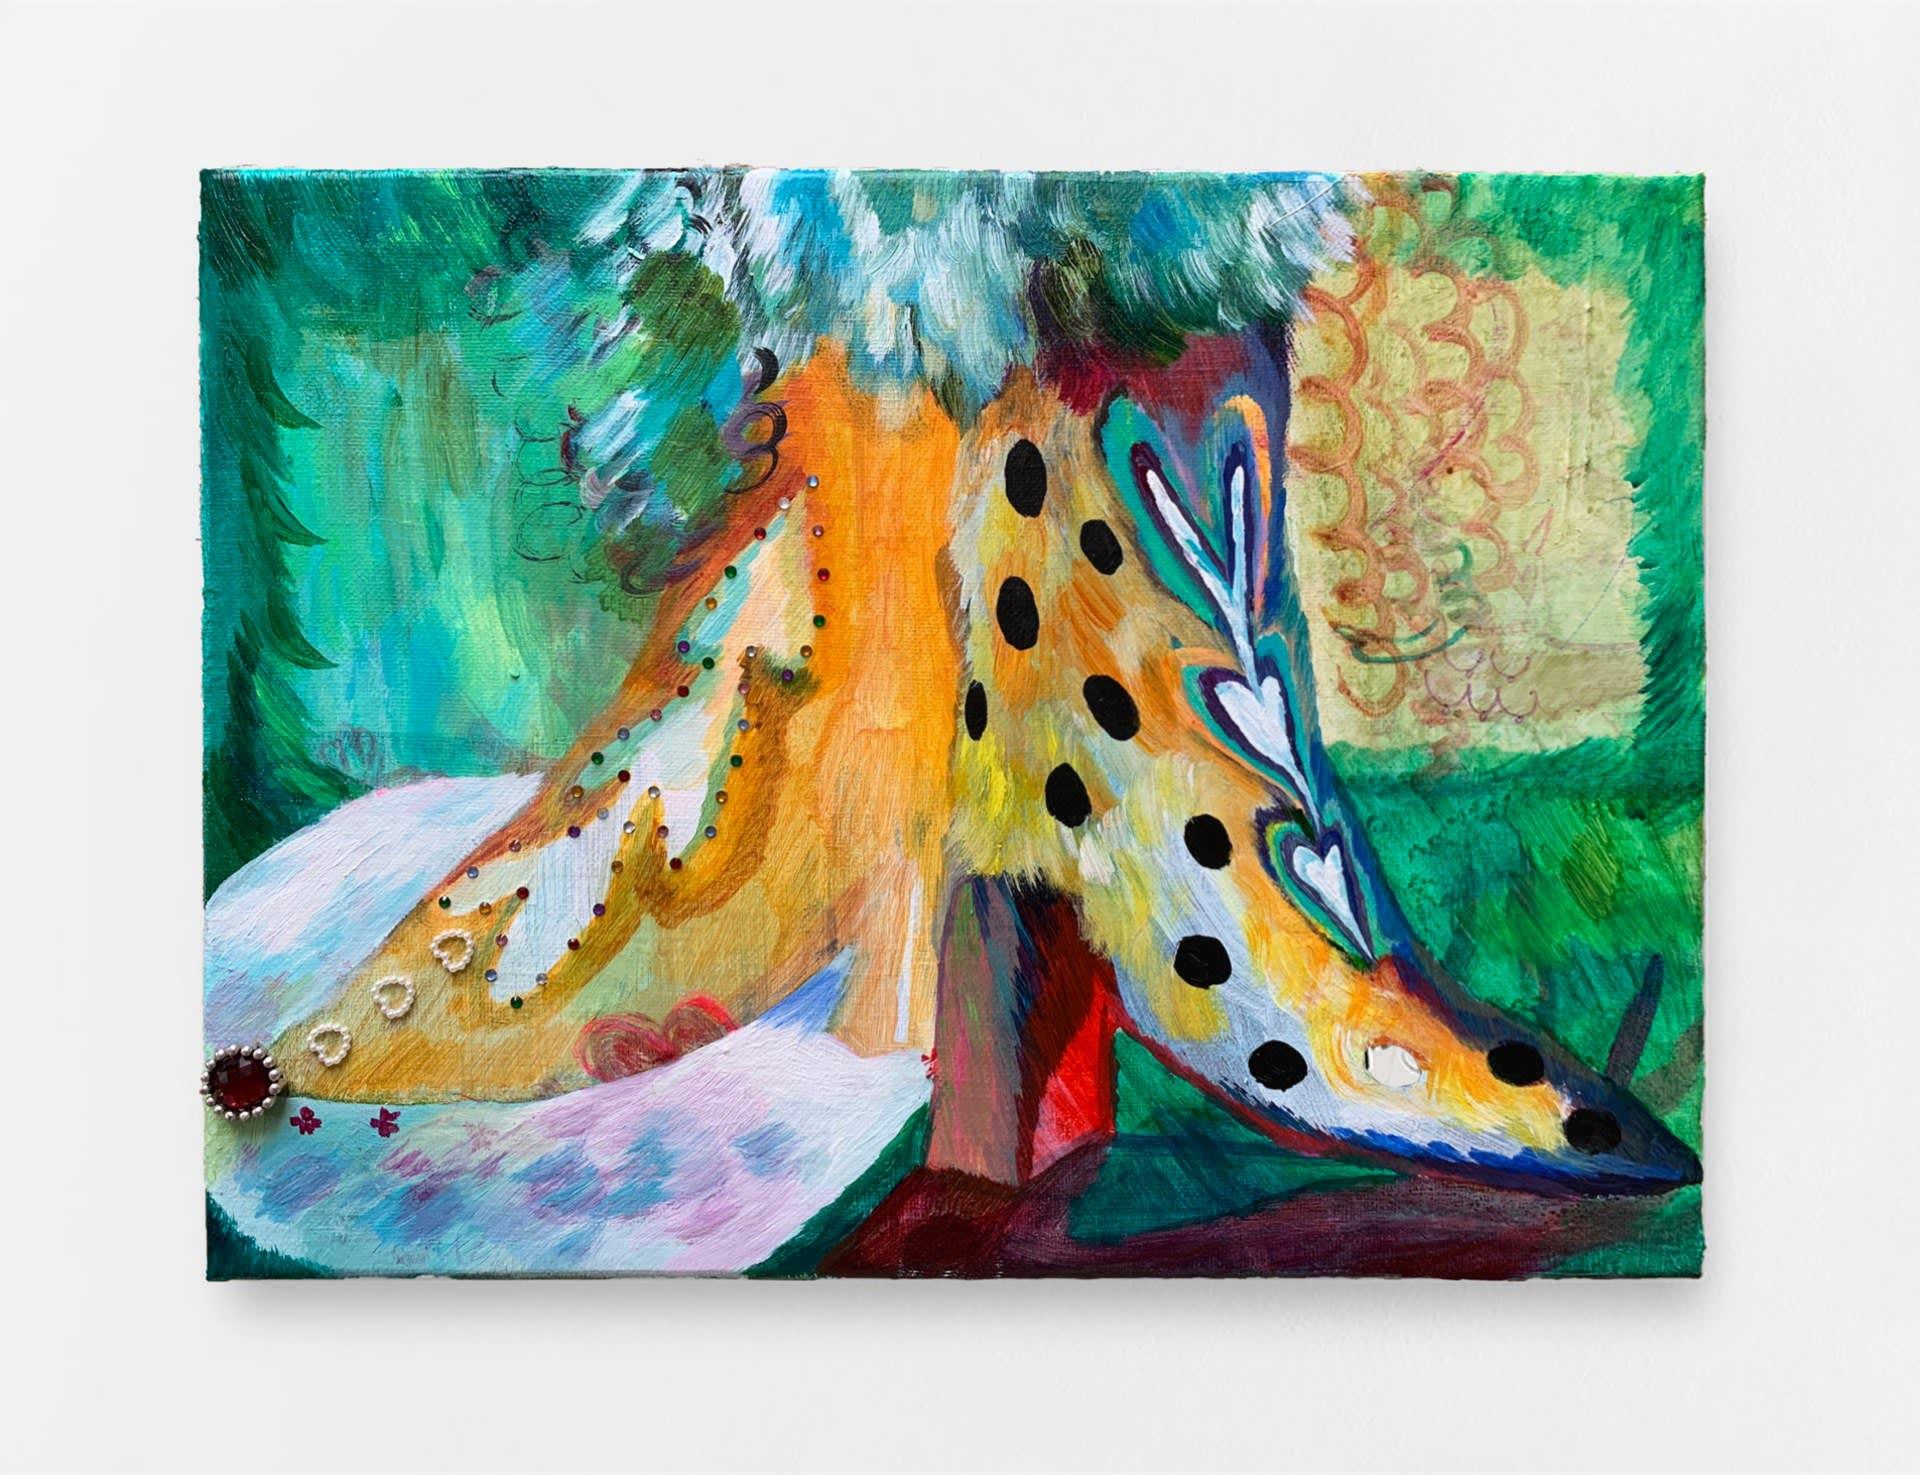 LoveBoy88, 2020, acrylic on canvas, 30 x 40 cm